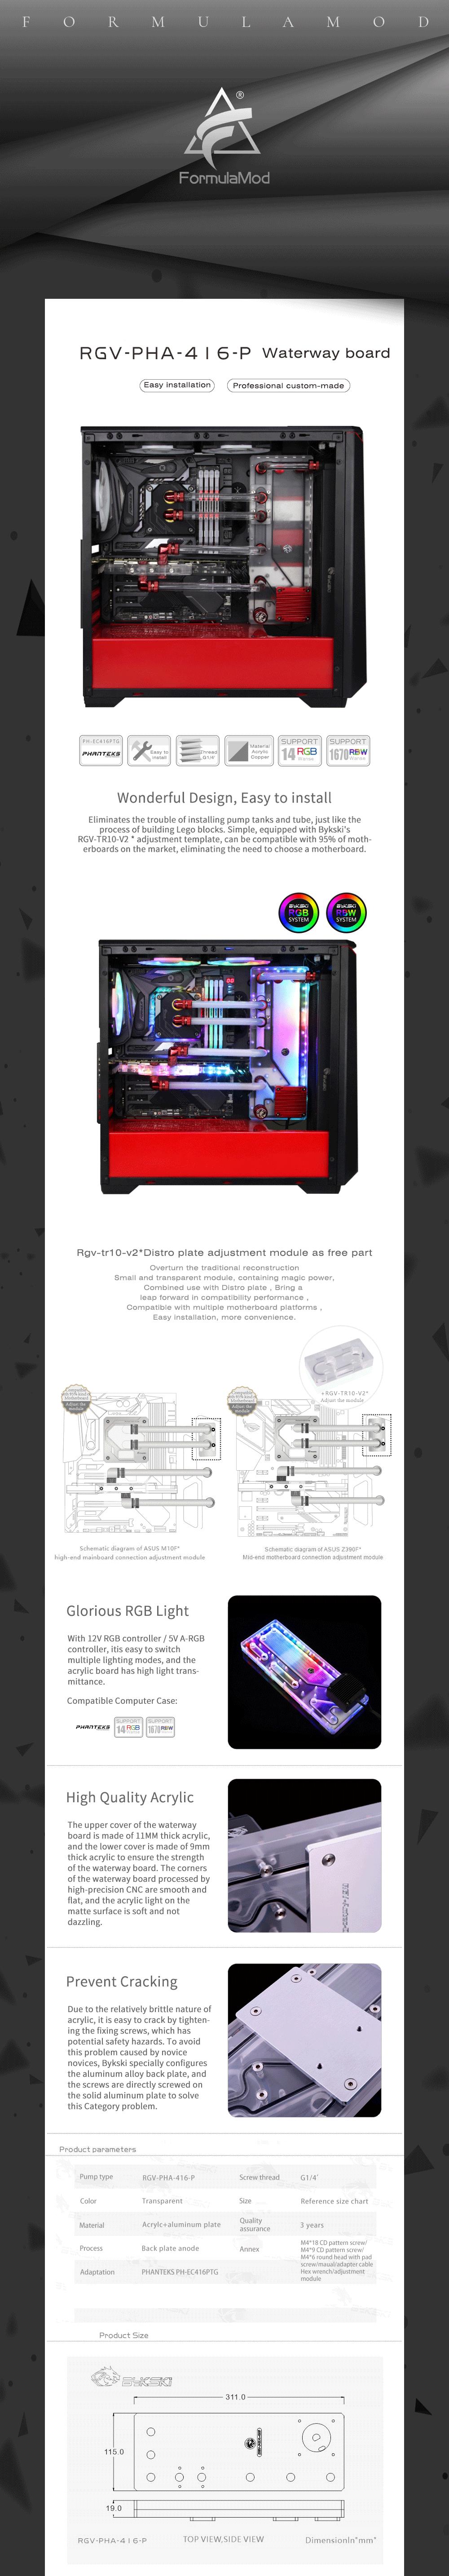 Bykski Waterway Cooling Kit For PHANTEKS PH-EC416 PTG Case, 5V ARGB, For Single GPU Building, RGV-PHA-416-P